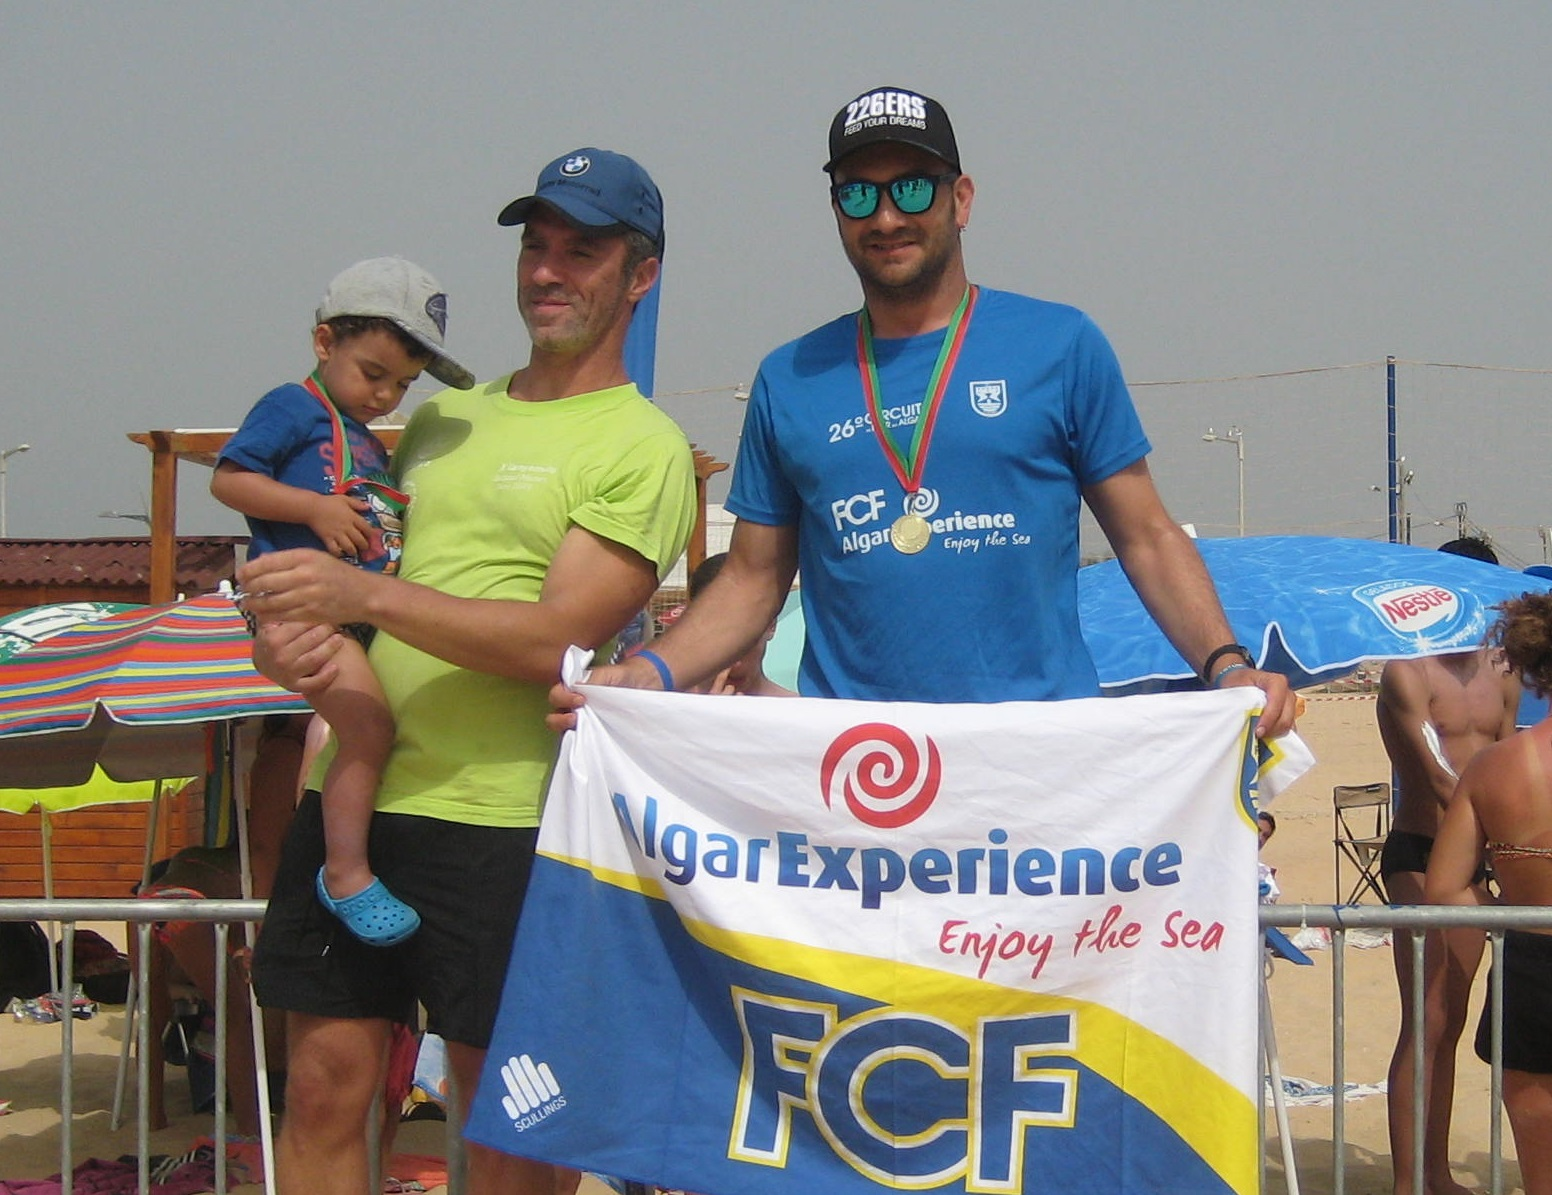 Circuito Algarve : Autódromo internacional do algarve english en wikipedia oru flickr